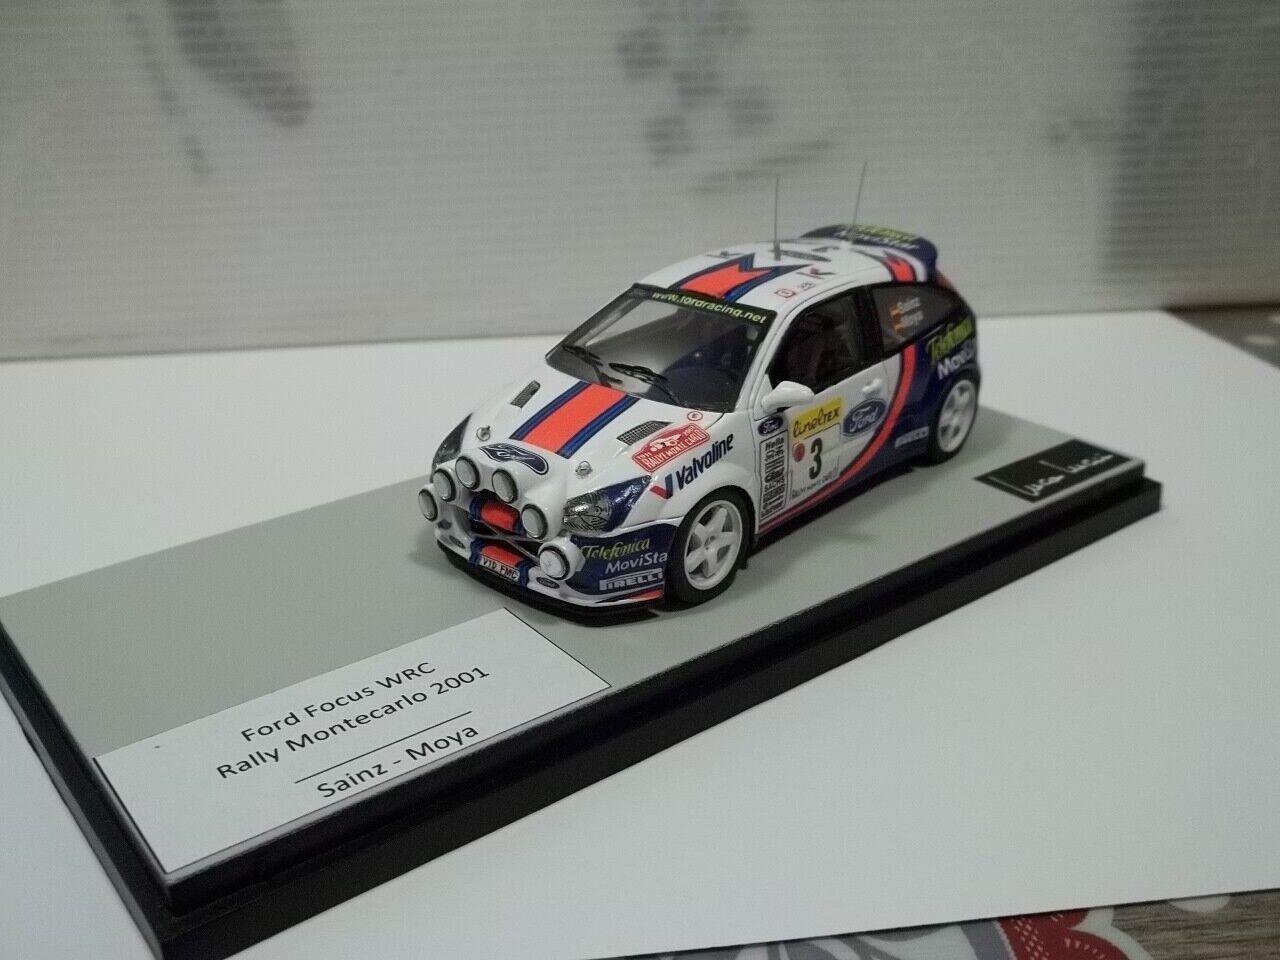 diseños exclusivos Provence moulage,sc1 43 ford focus wrc wrc wrc monteCochelo 2001 sainz  barato